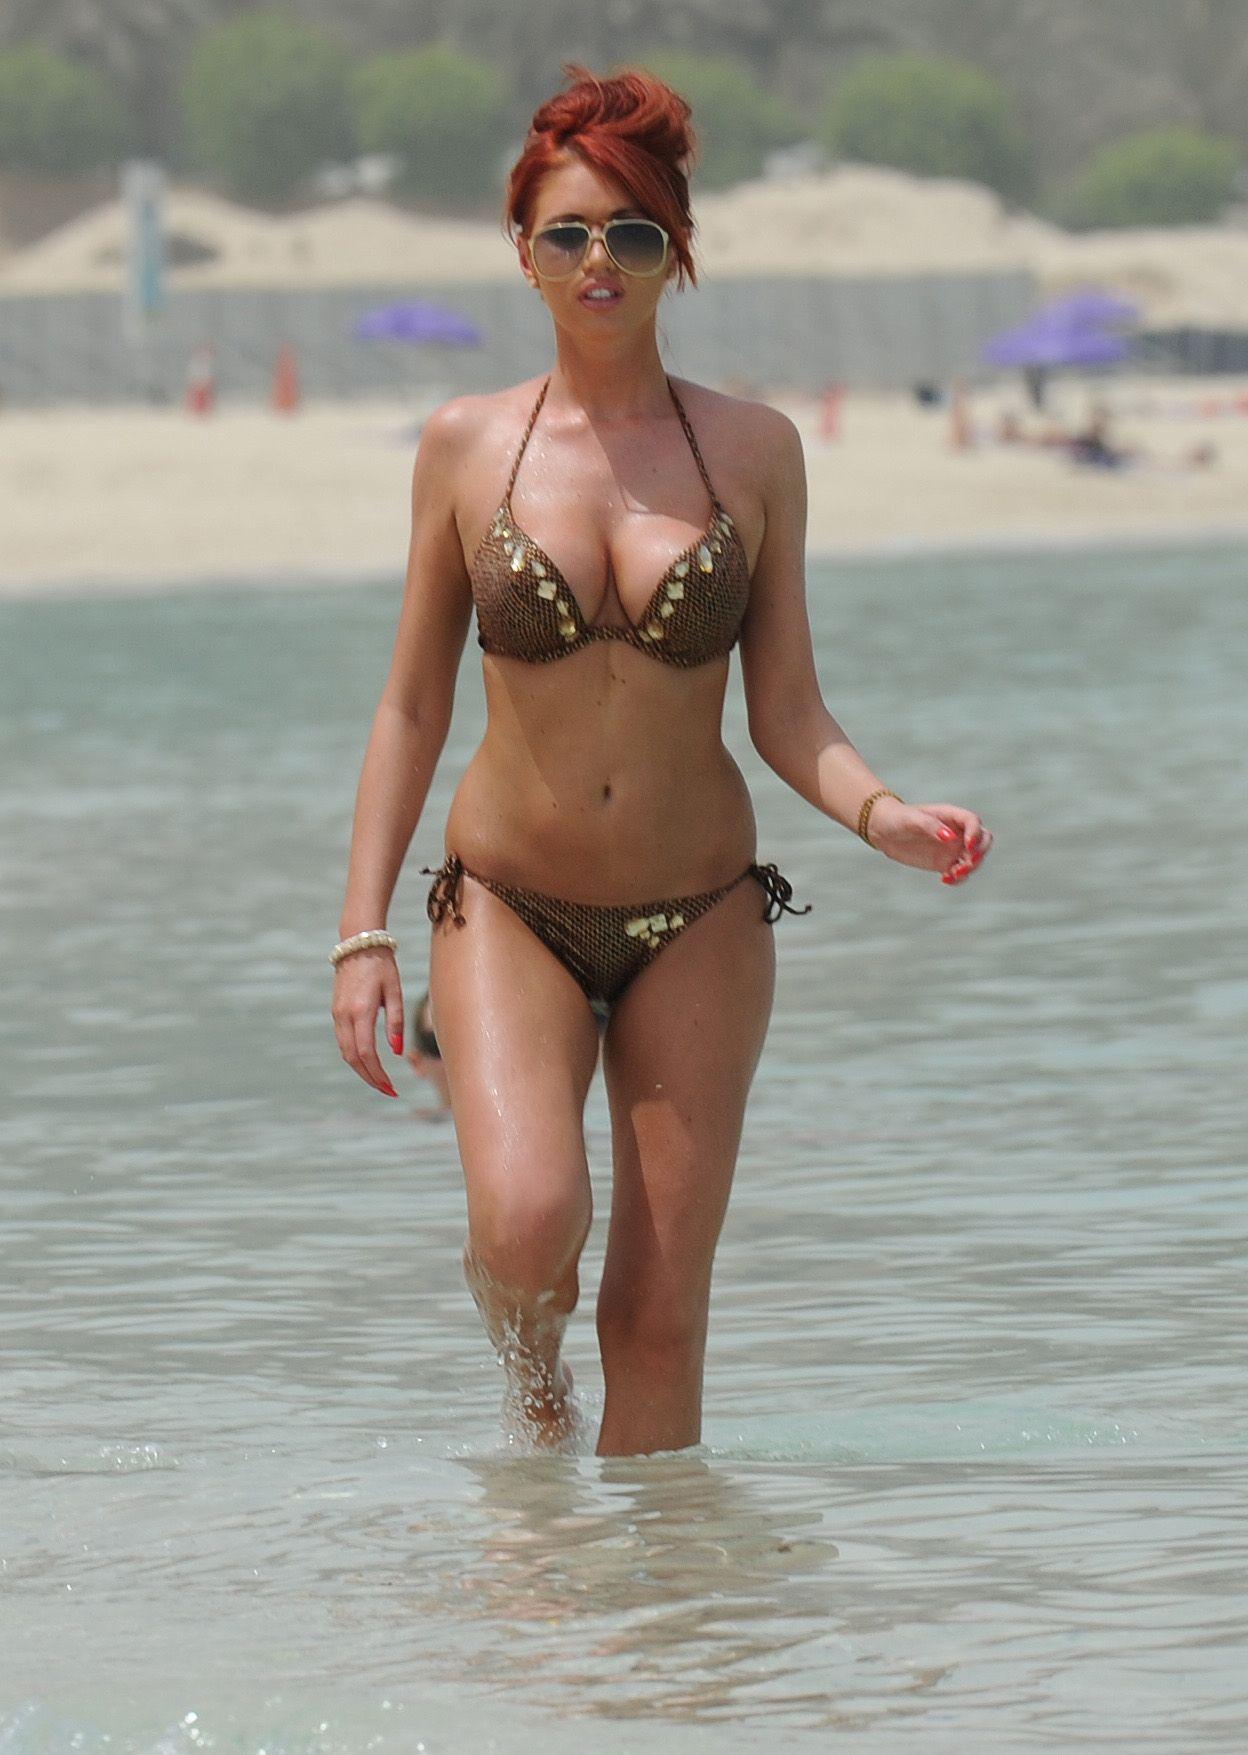 Bikini Amy Childs nude photos 2019